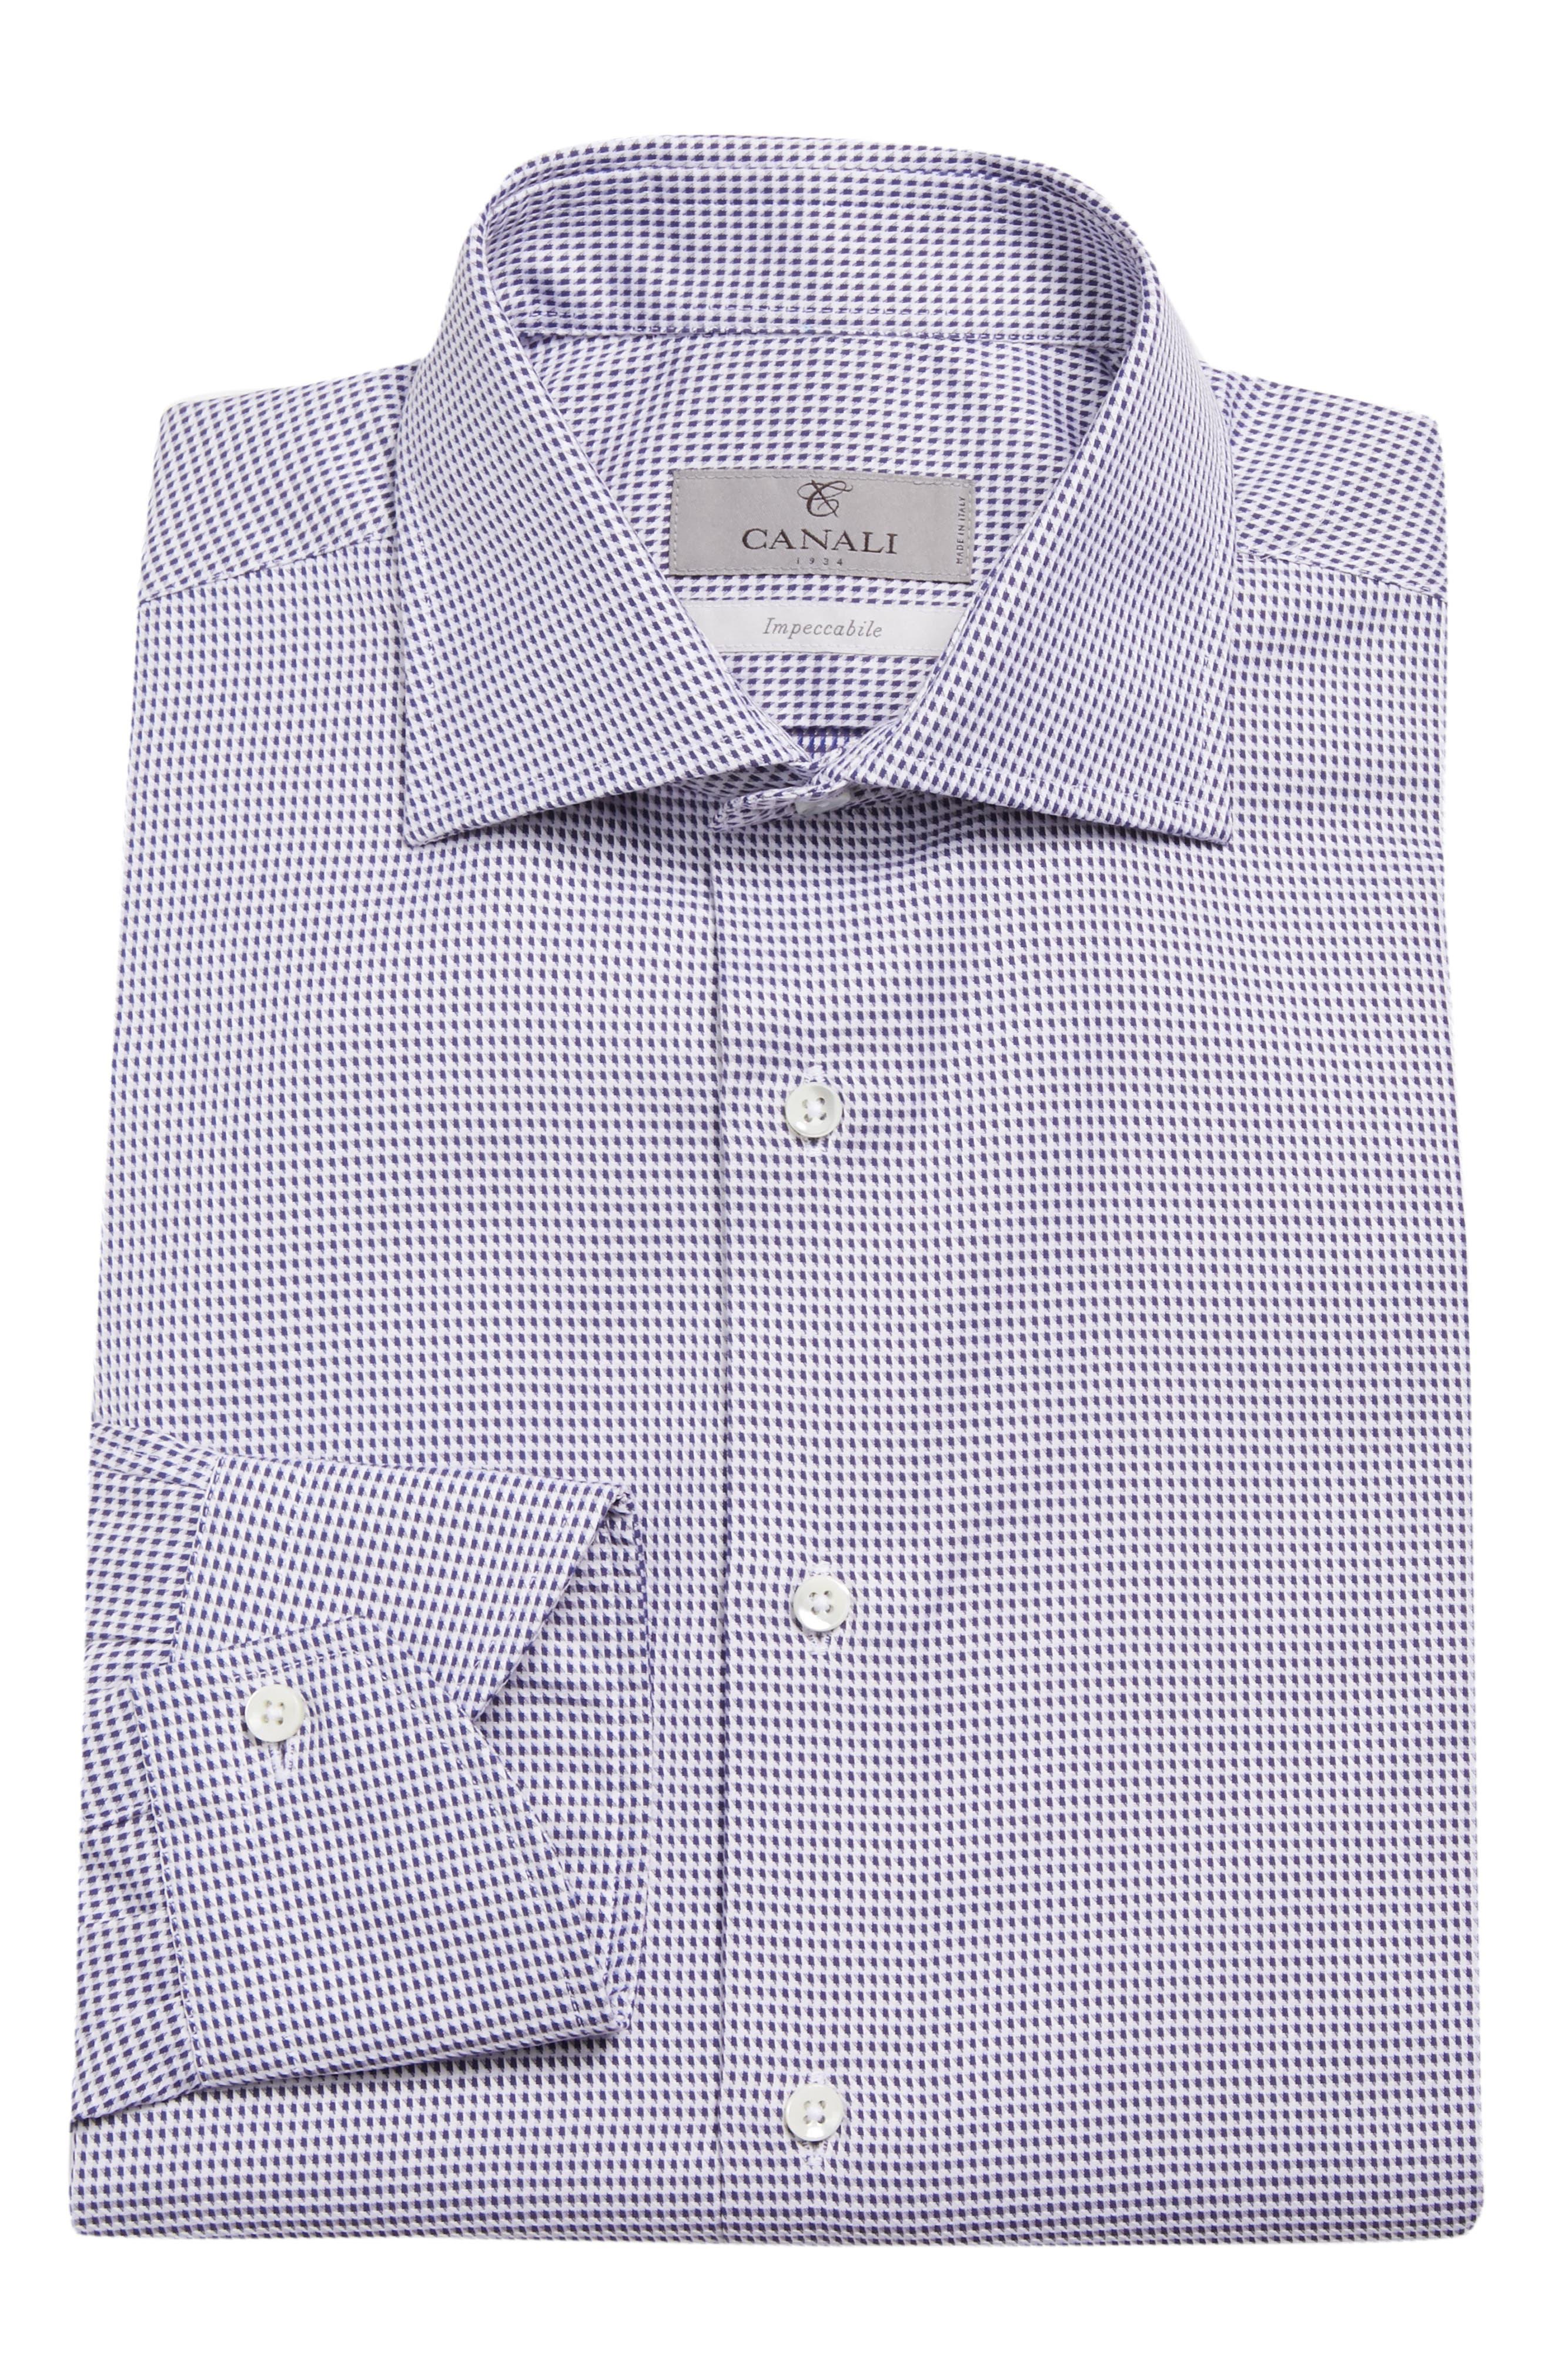 Regular Fit Print Dress Shirt,                             Alternate thumbnail 5, color,                             401